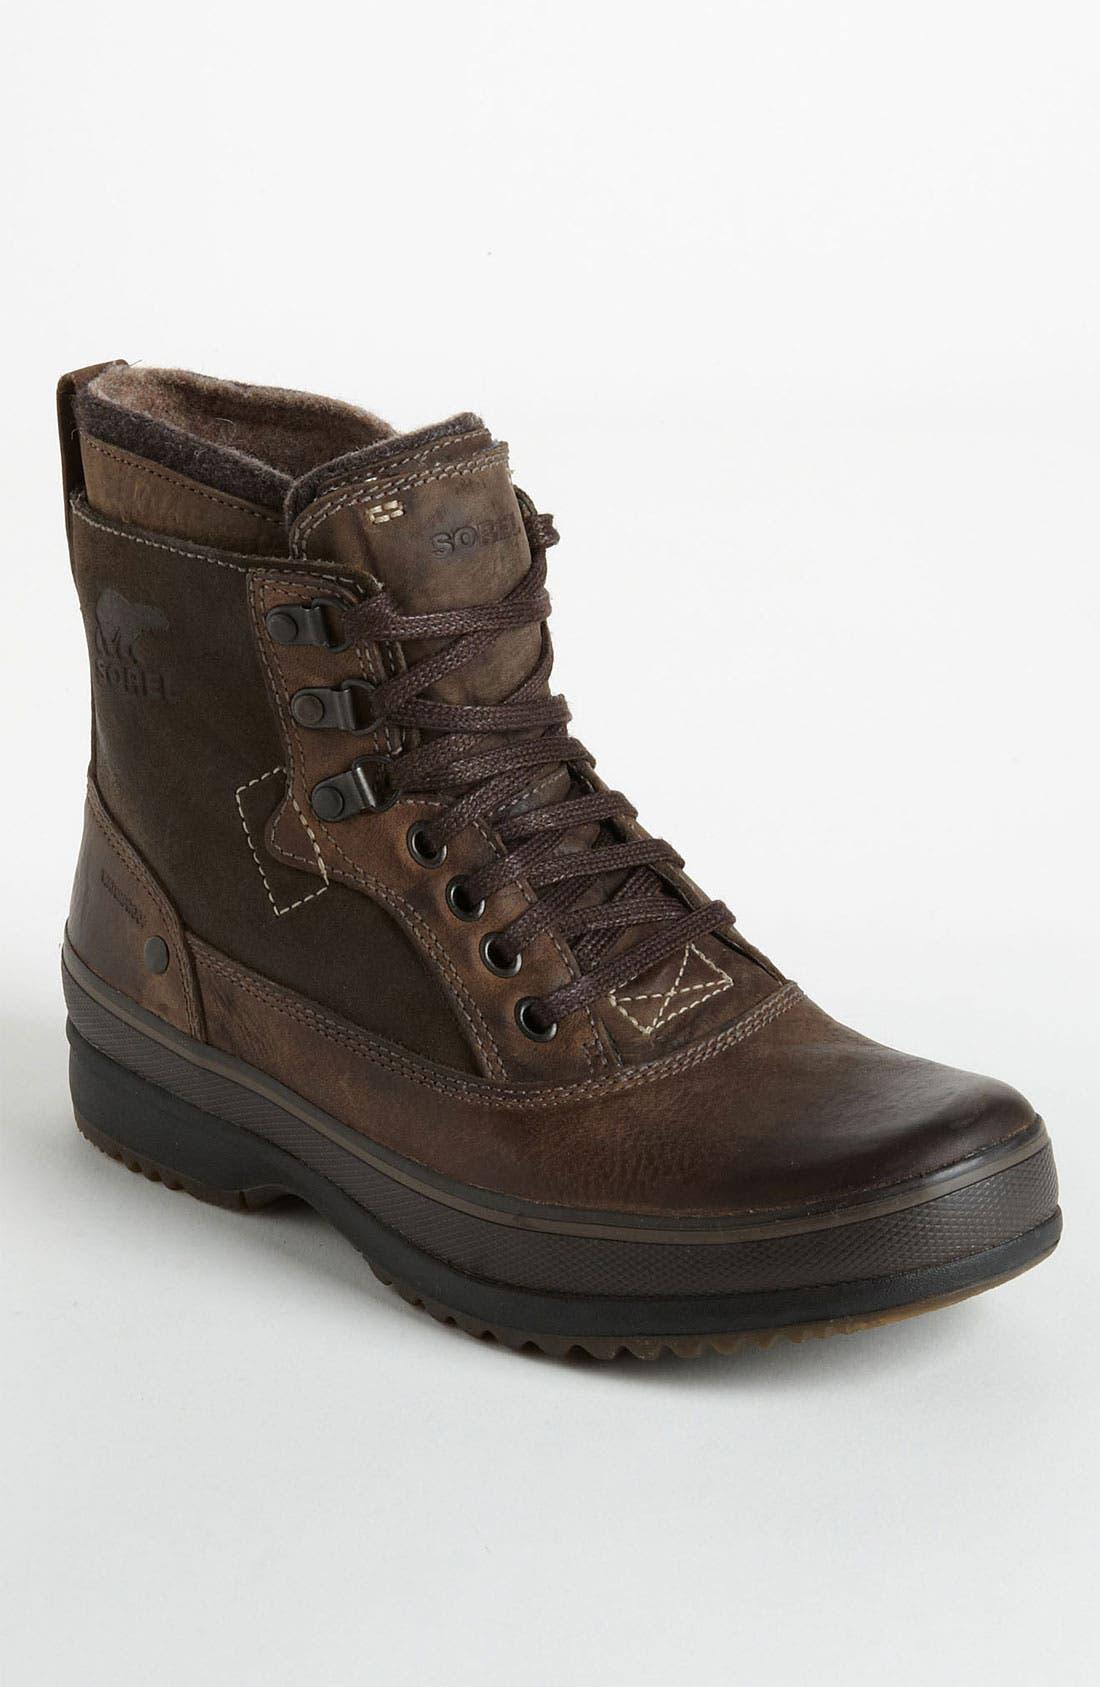 Alternate Image 1 Selected - Sorel 'Brimley' Boot